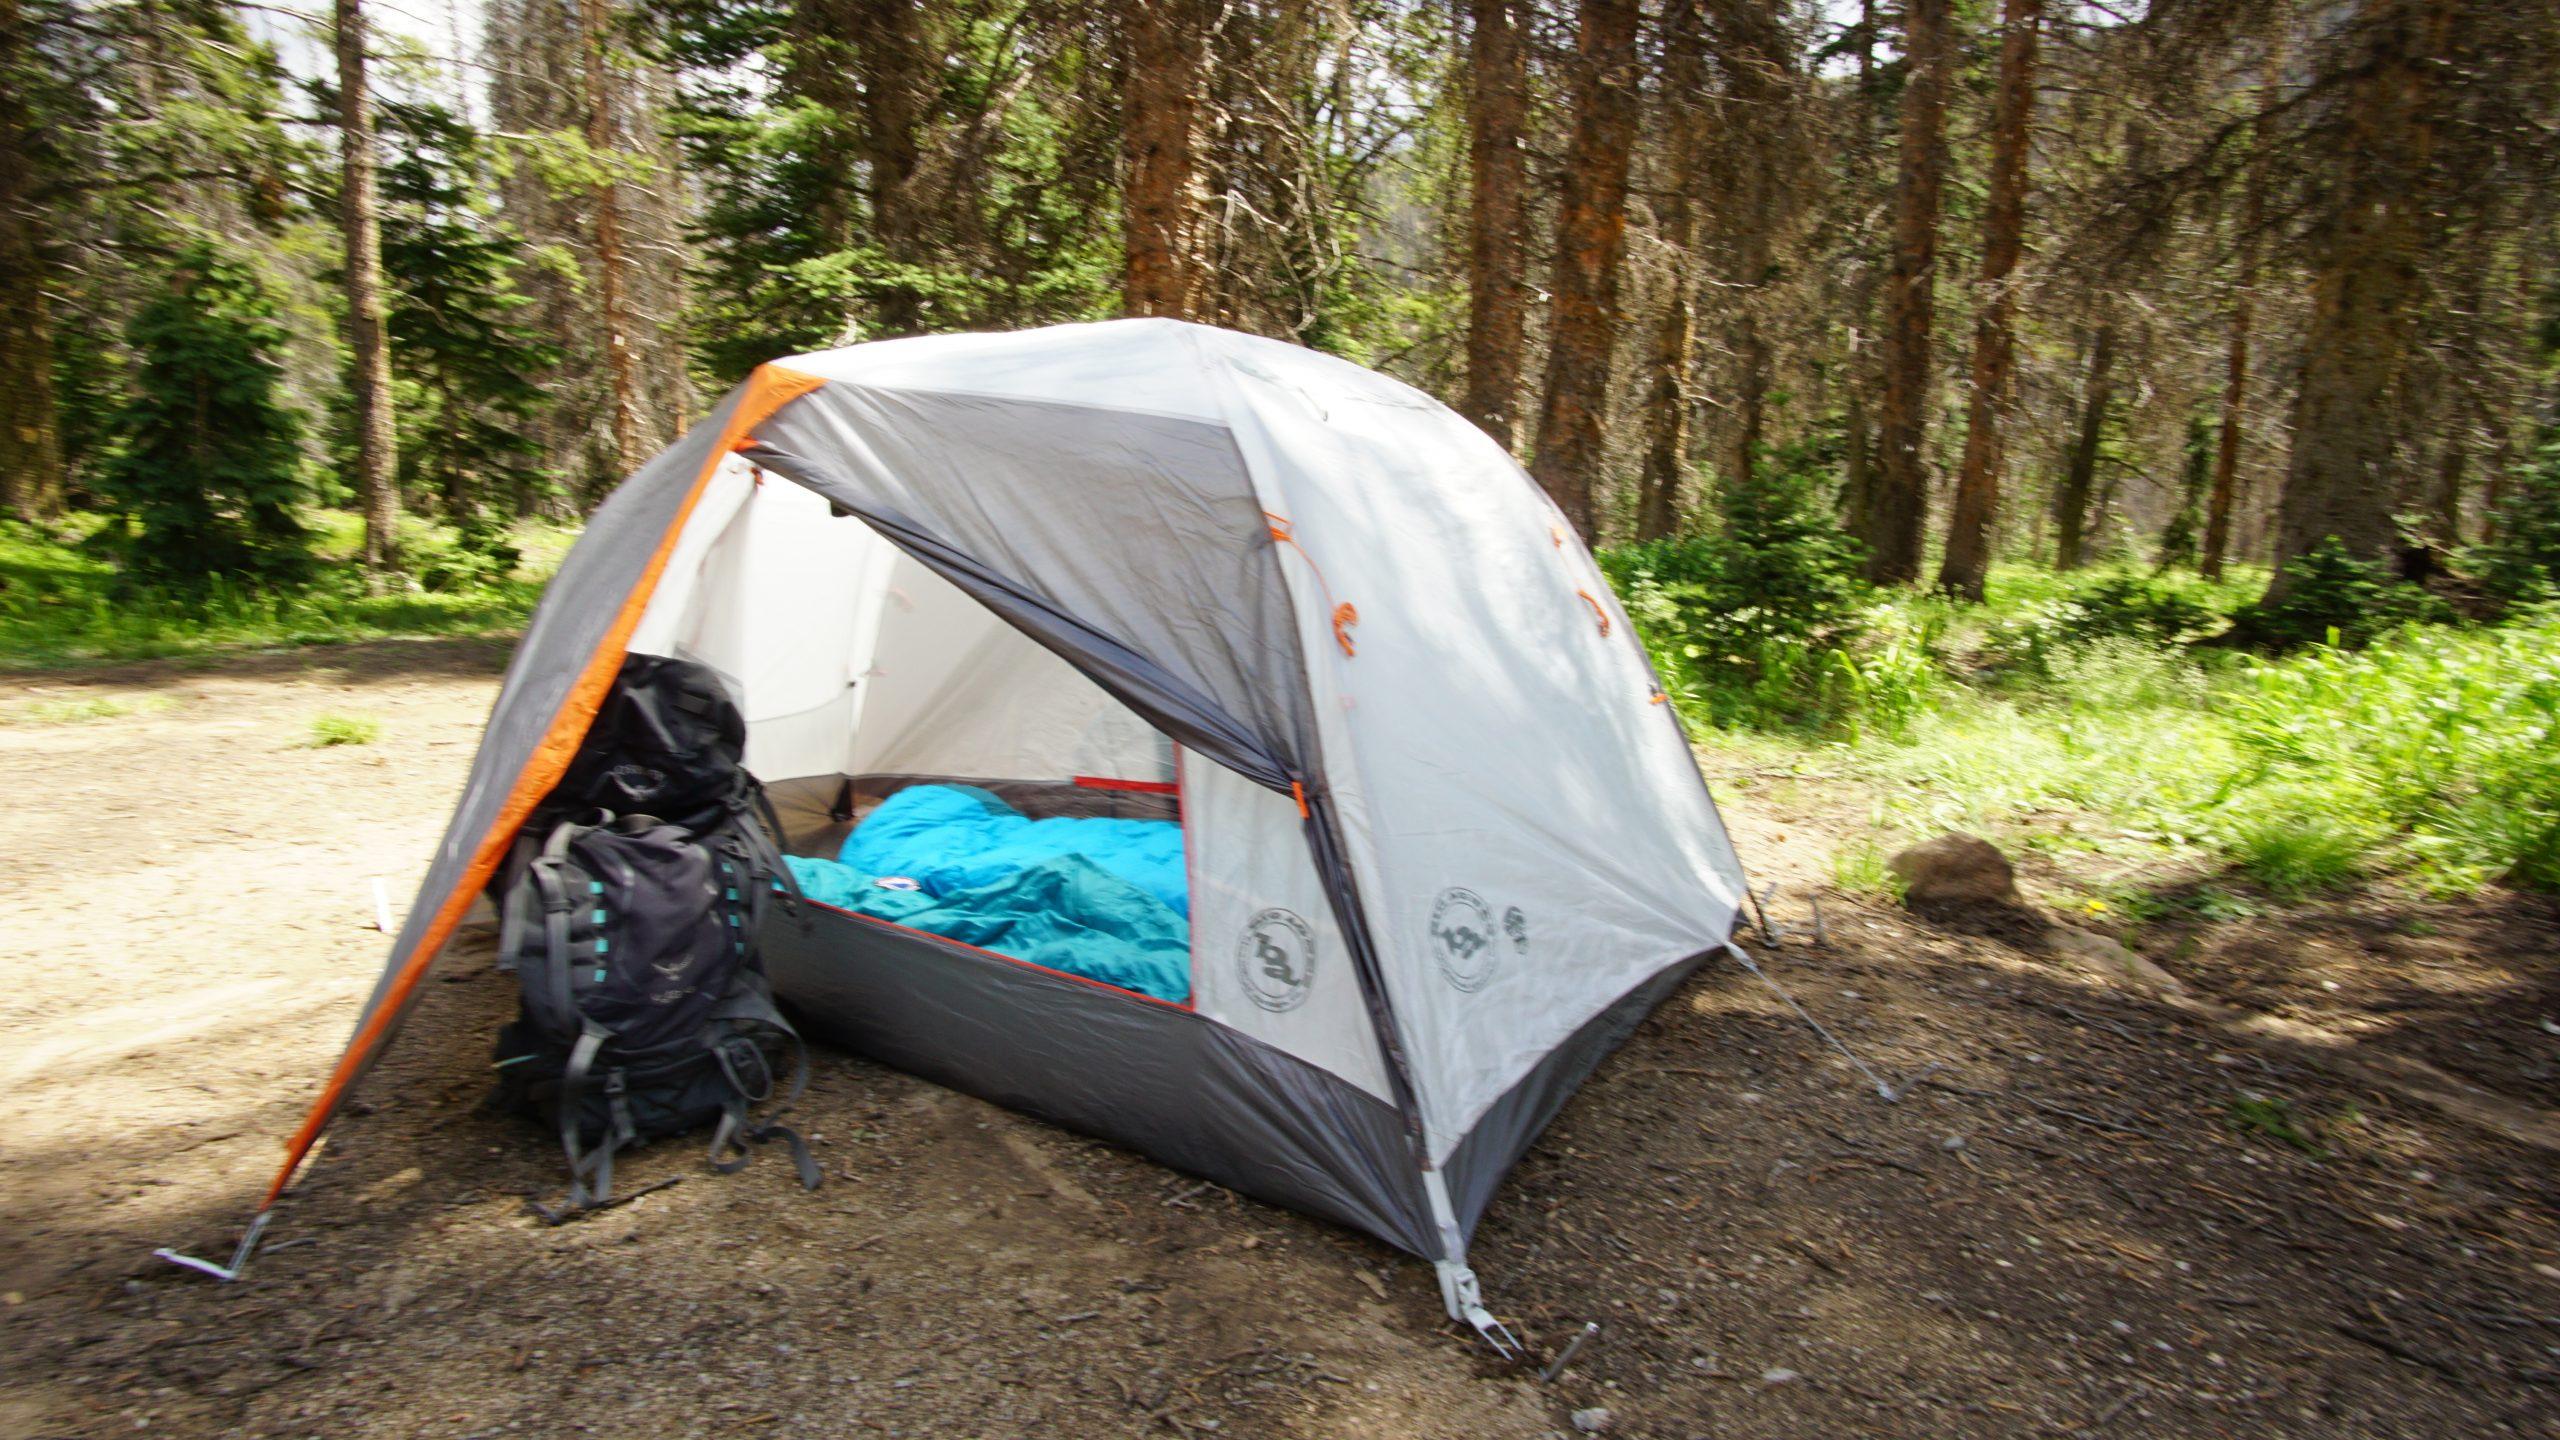 Review: Big Agnes Copper Spur UL2 mtnGLO